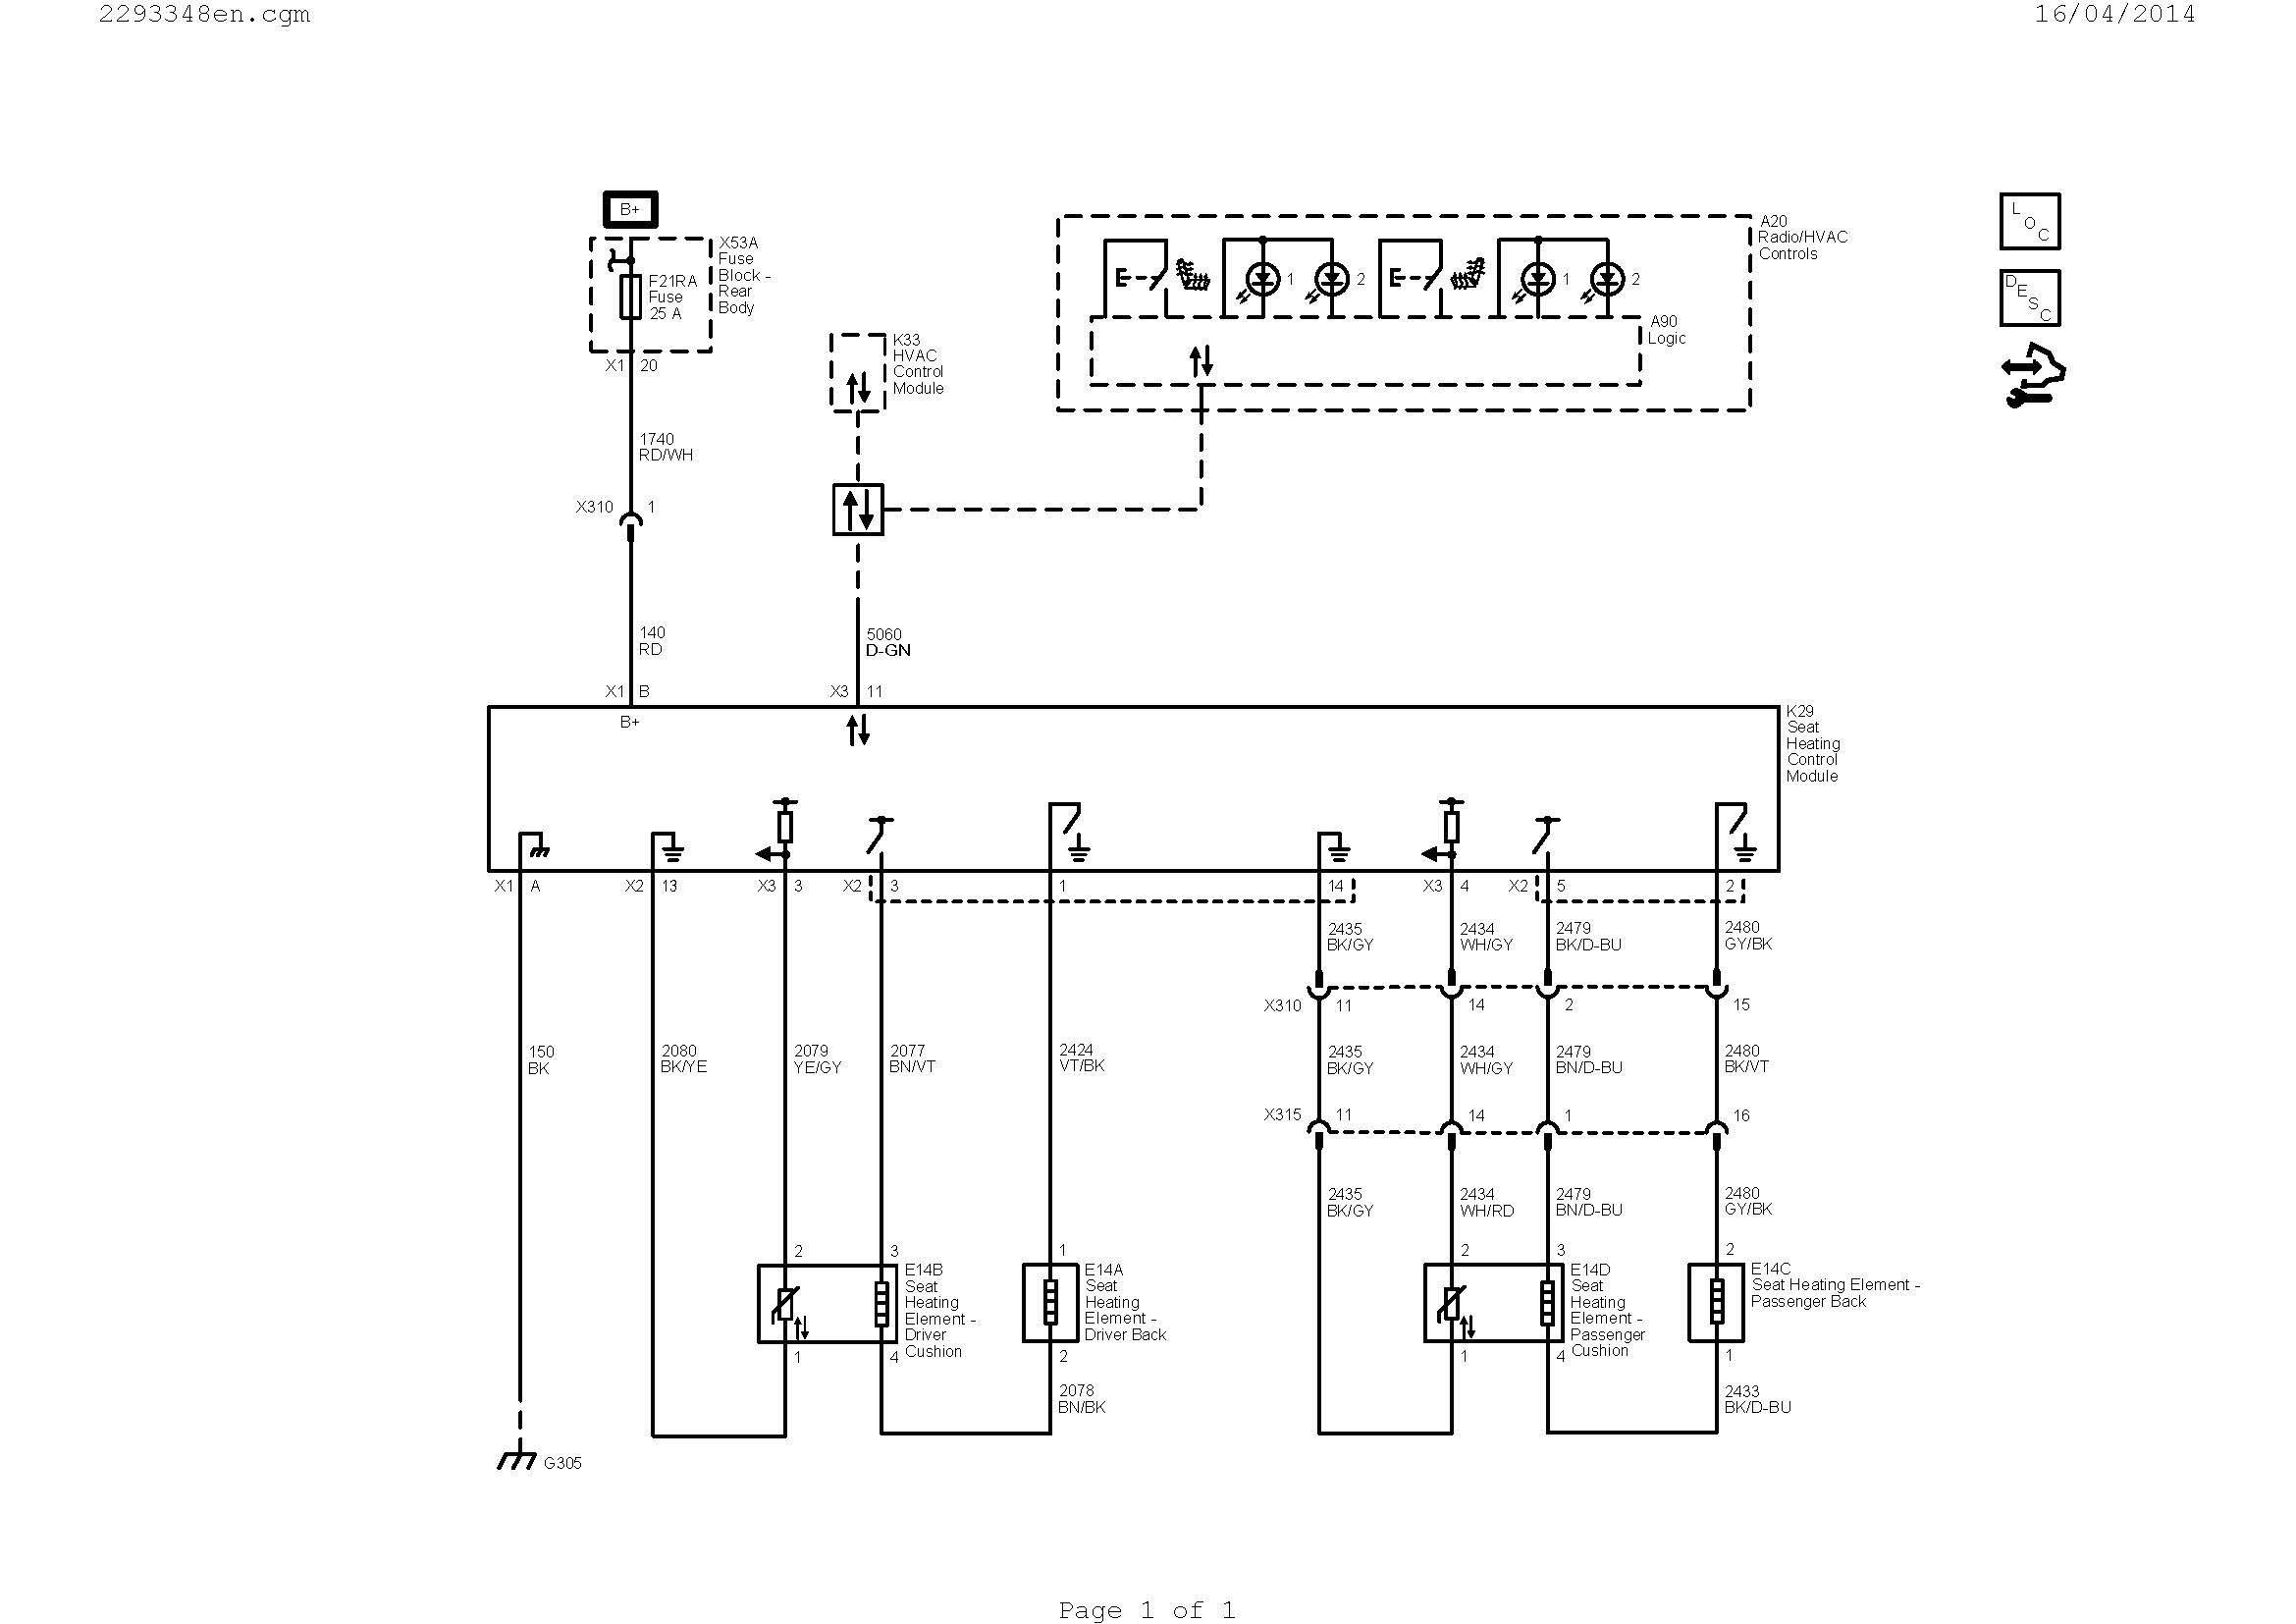 wiring diagram program Collection-Guitar Wiring Diagram Editor Best Wiring Diagram Guitar Fresh Hvac Diagram Best Hvac Diagram 0d 9-k